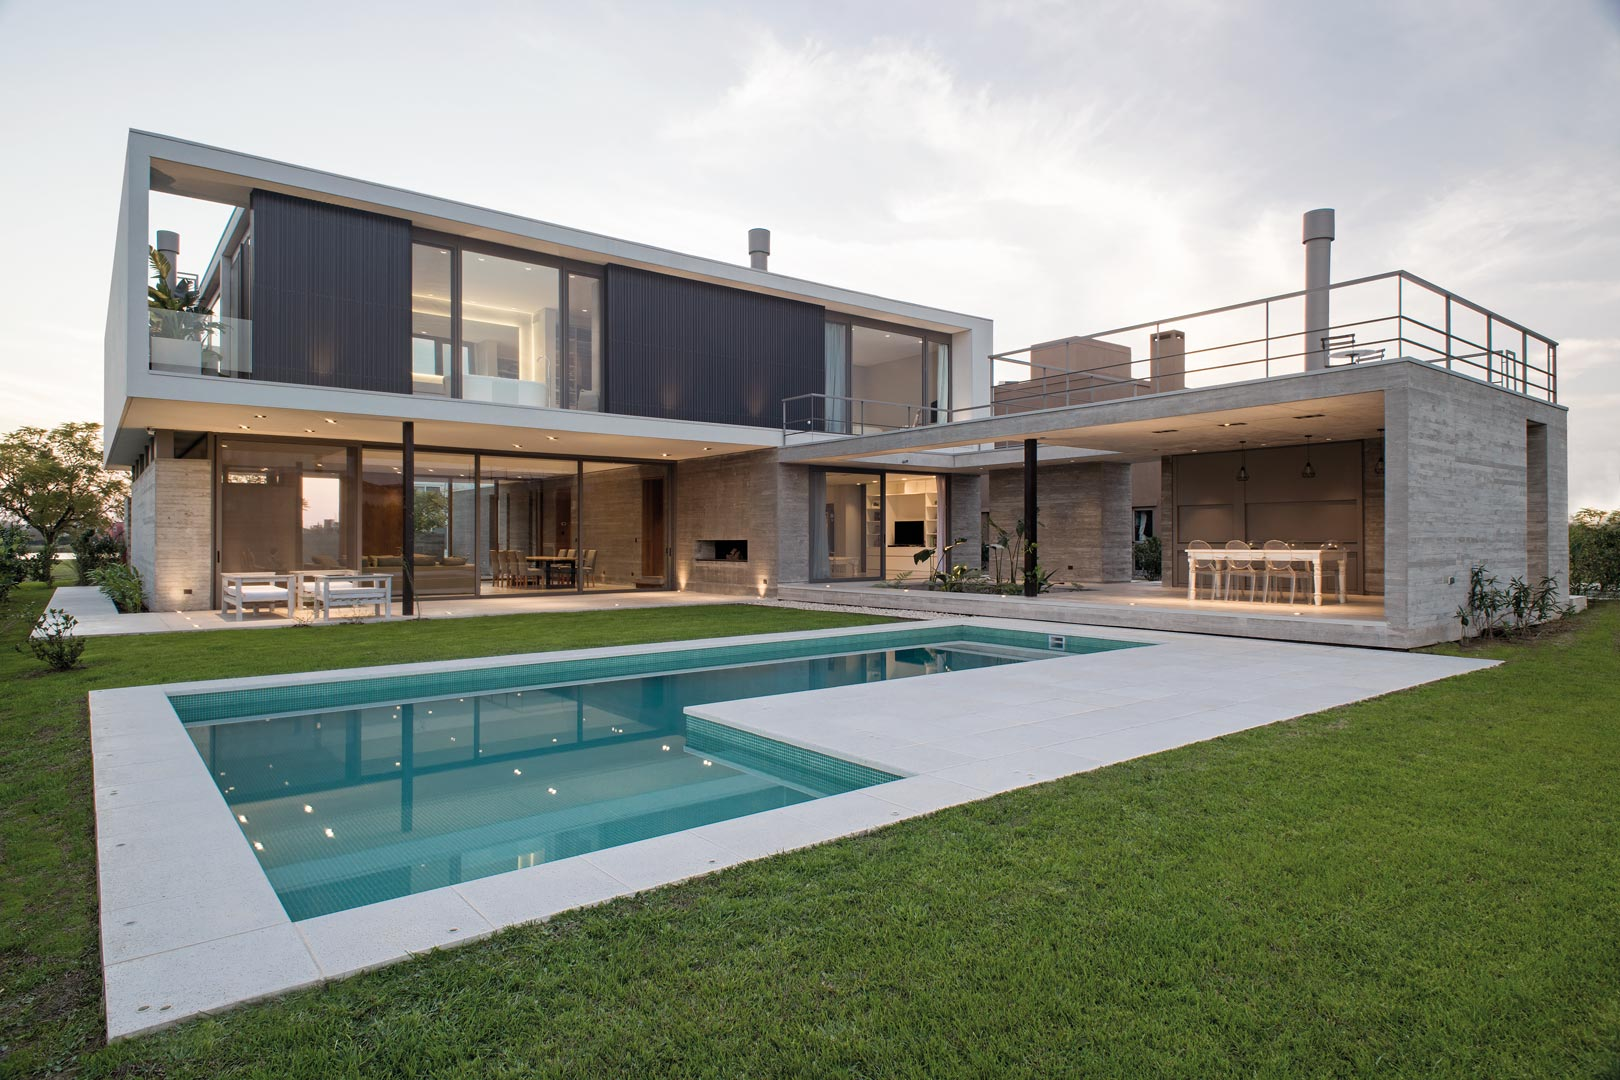 Amado cattaneo arquitectos casa racionalista portal de arquitectos - Arquitectos casas modernas ...